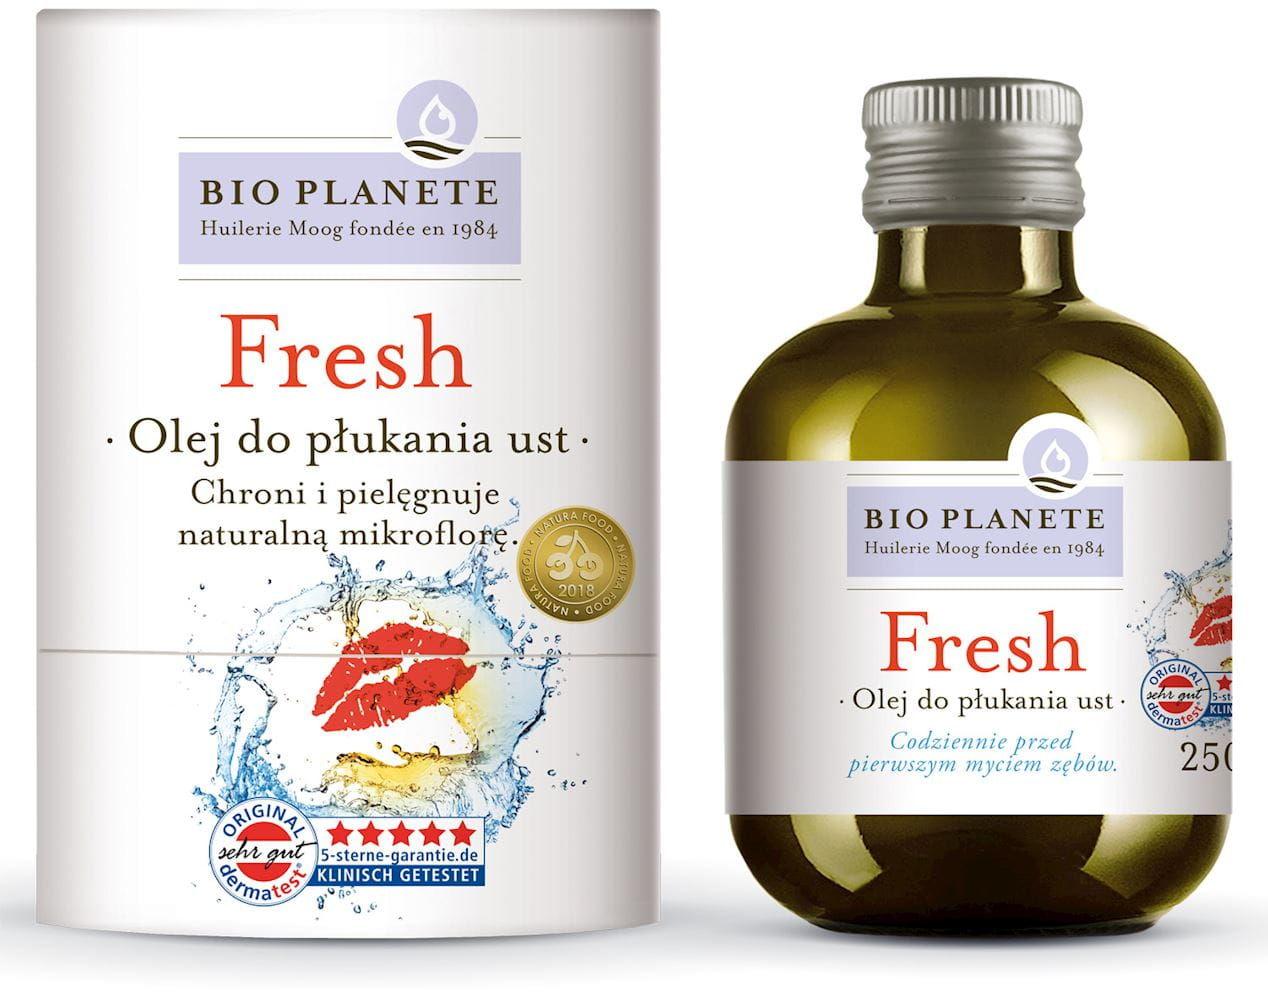 Olej do płukania ust 250 ml - bio planete